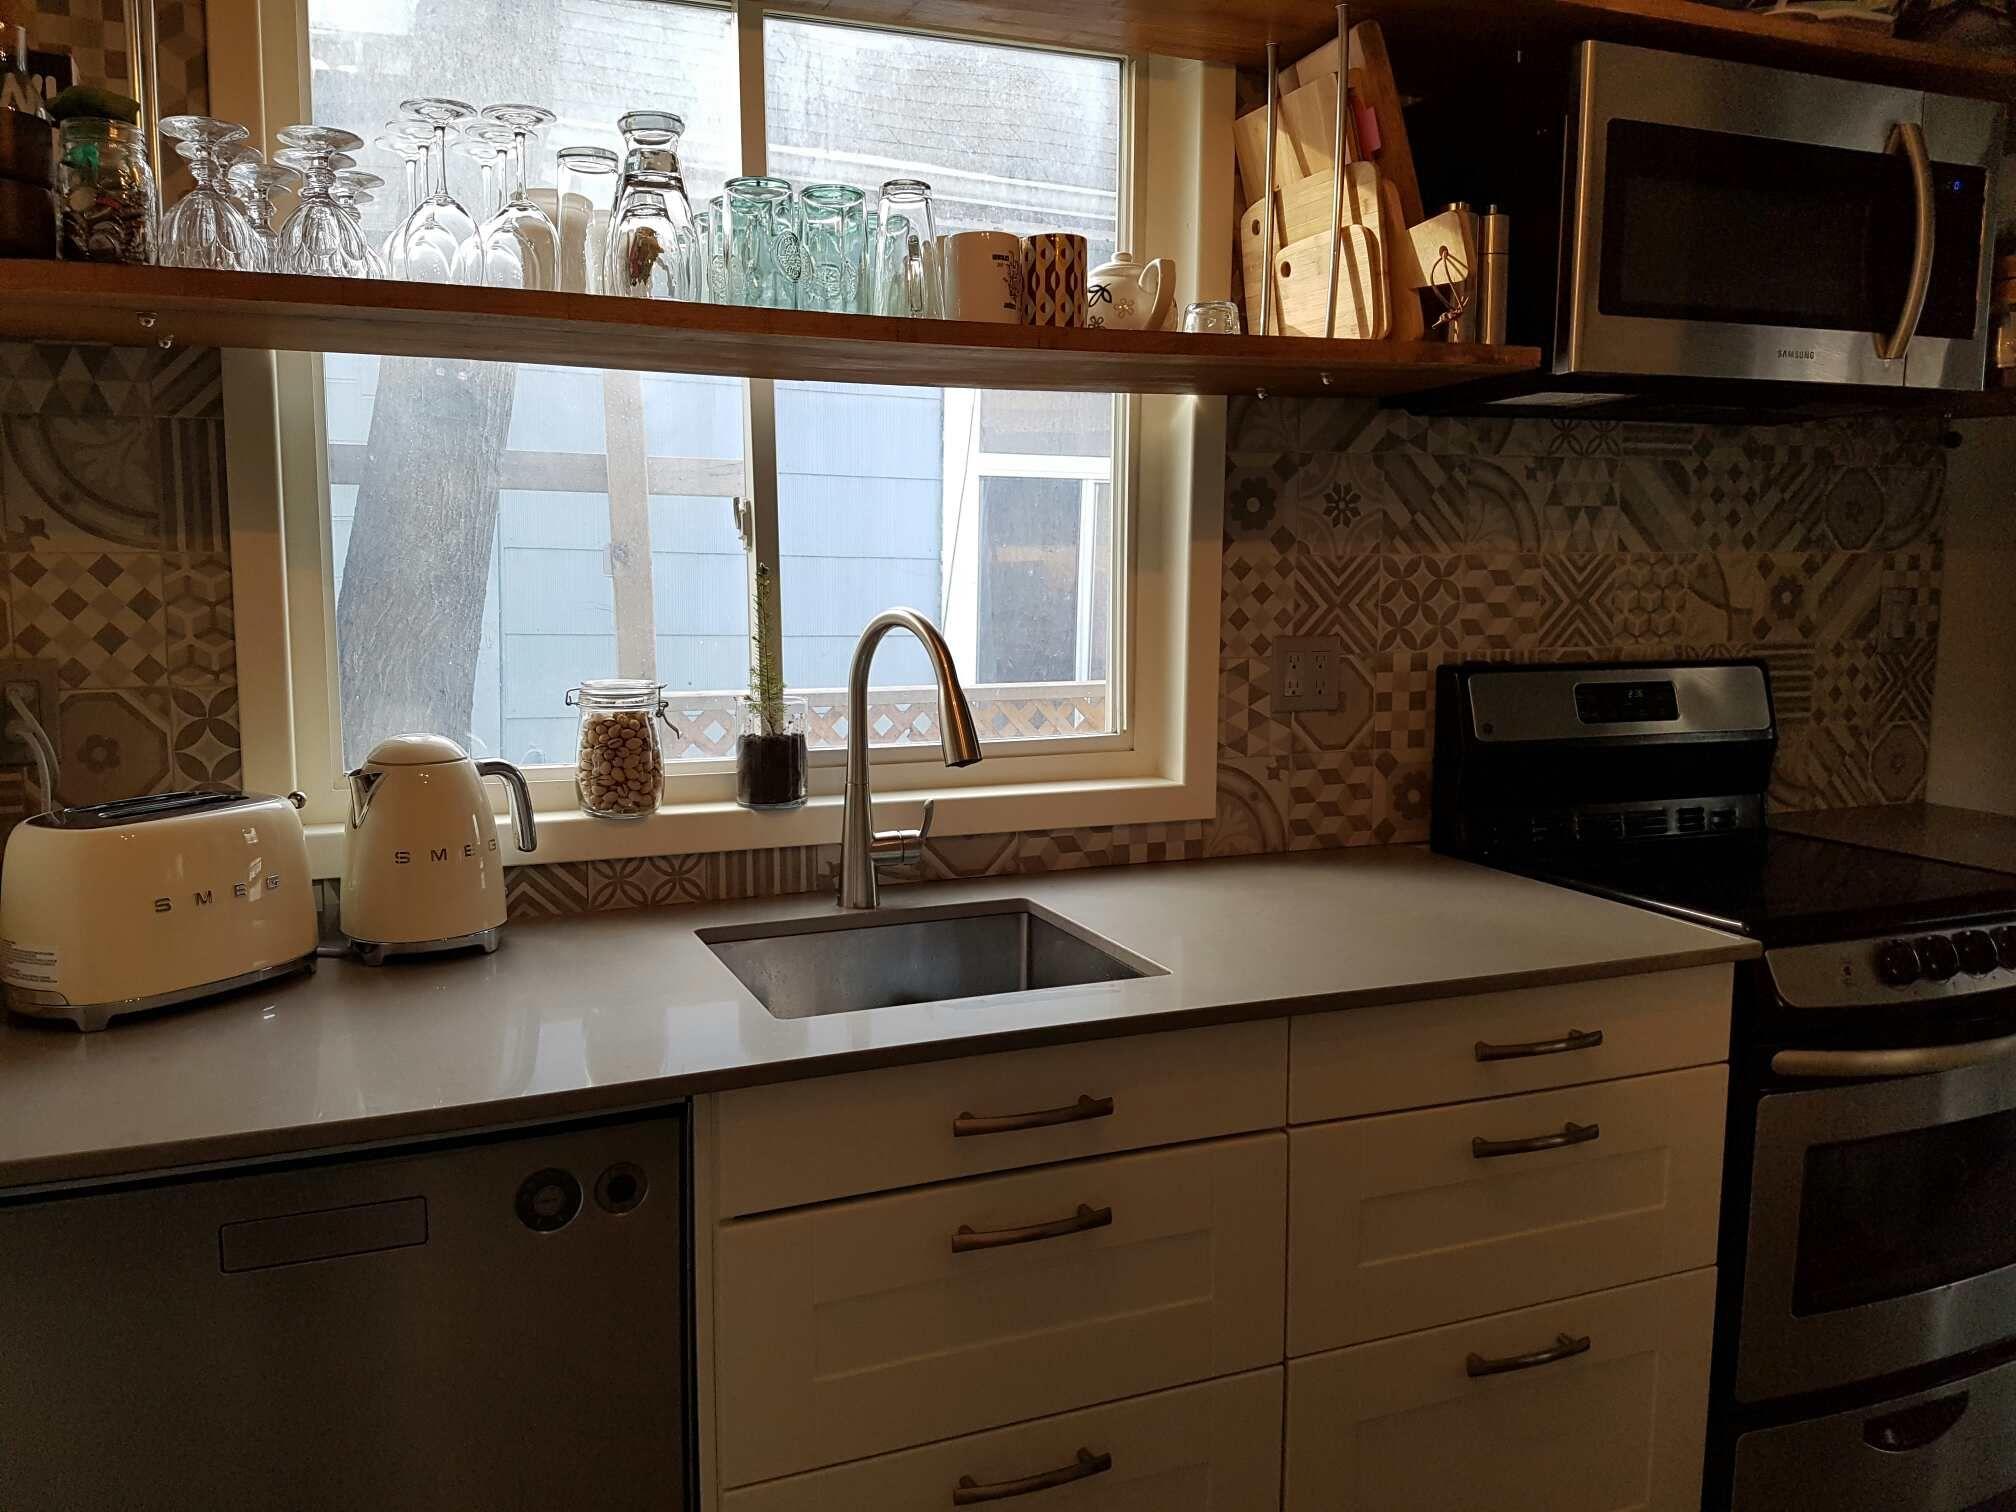 6x6 porcelain tile backsplash mosaic kitchen reno kitchenreno 6x6 porcelain tile backsplash mosaic kitchen reno kitchenreno dailygadgetfo Image collections